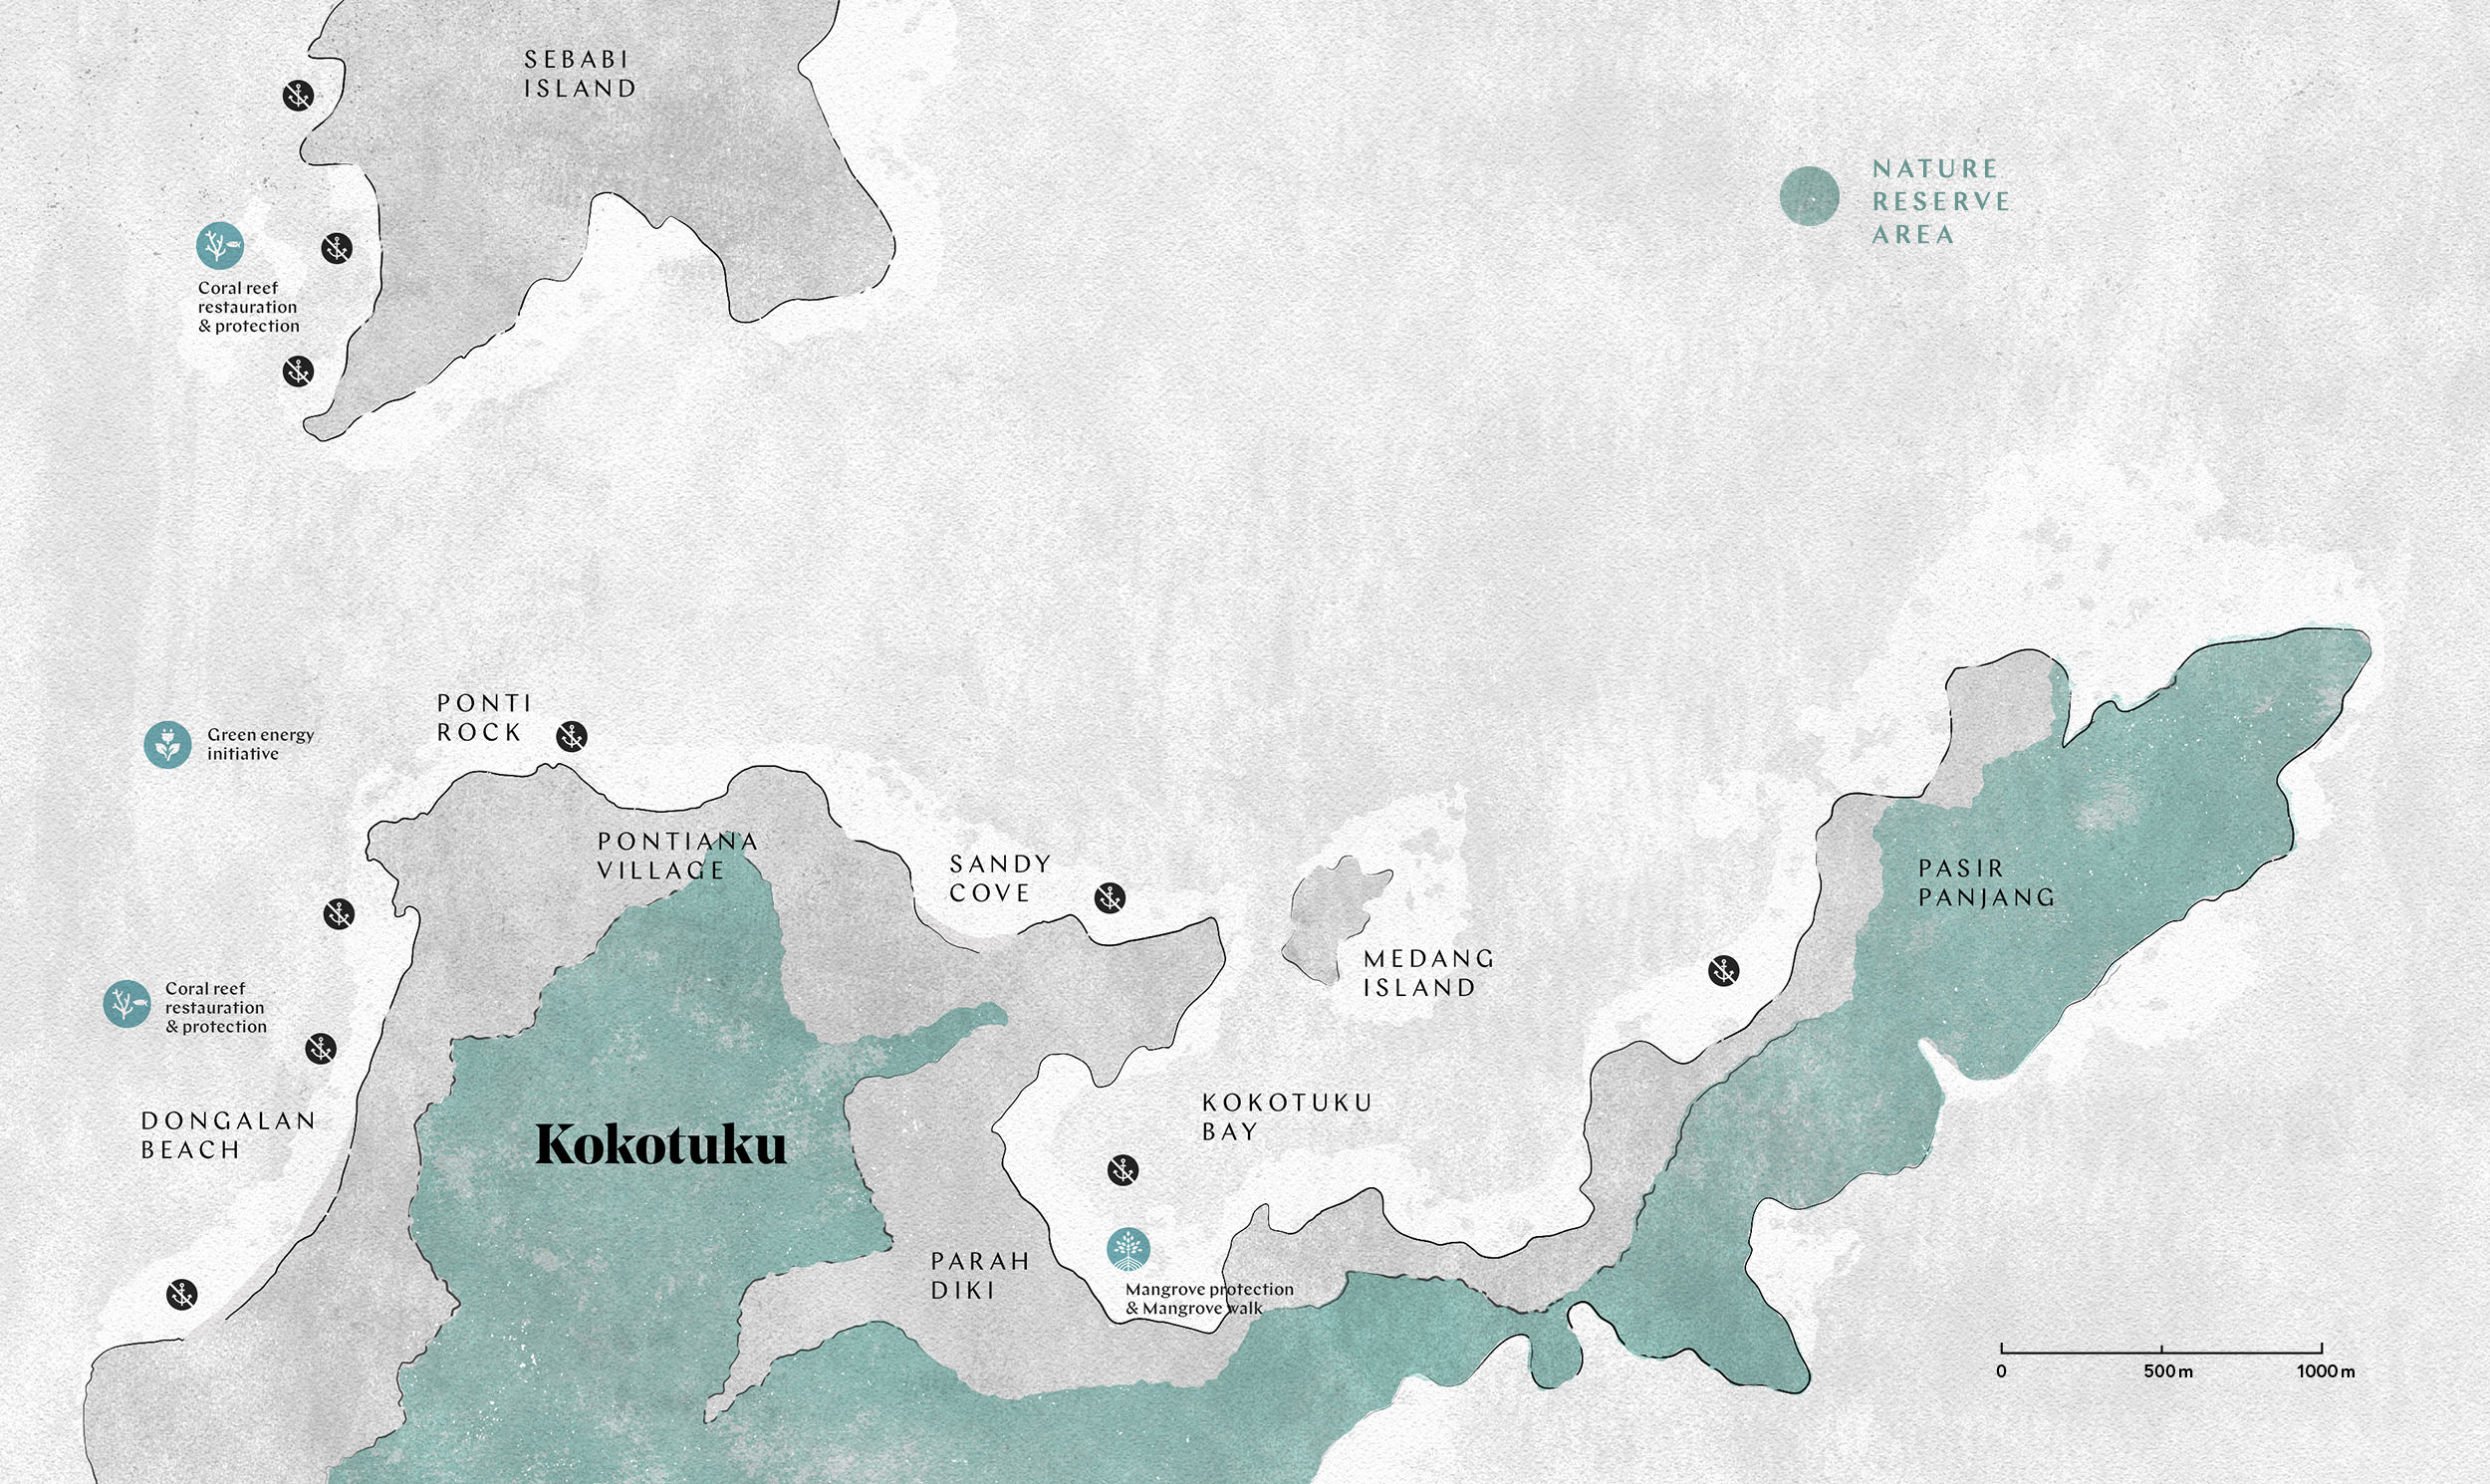 4_Kokotuku_Nature_Reserve_Area_scale.jpg